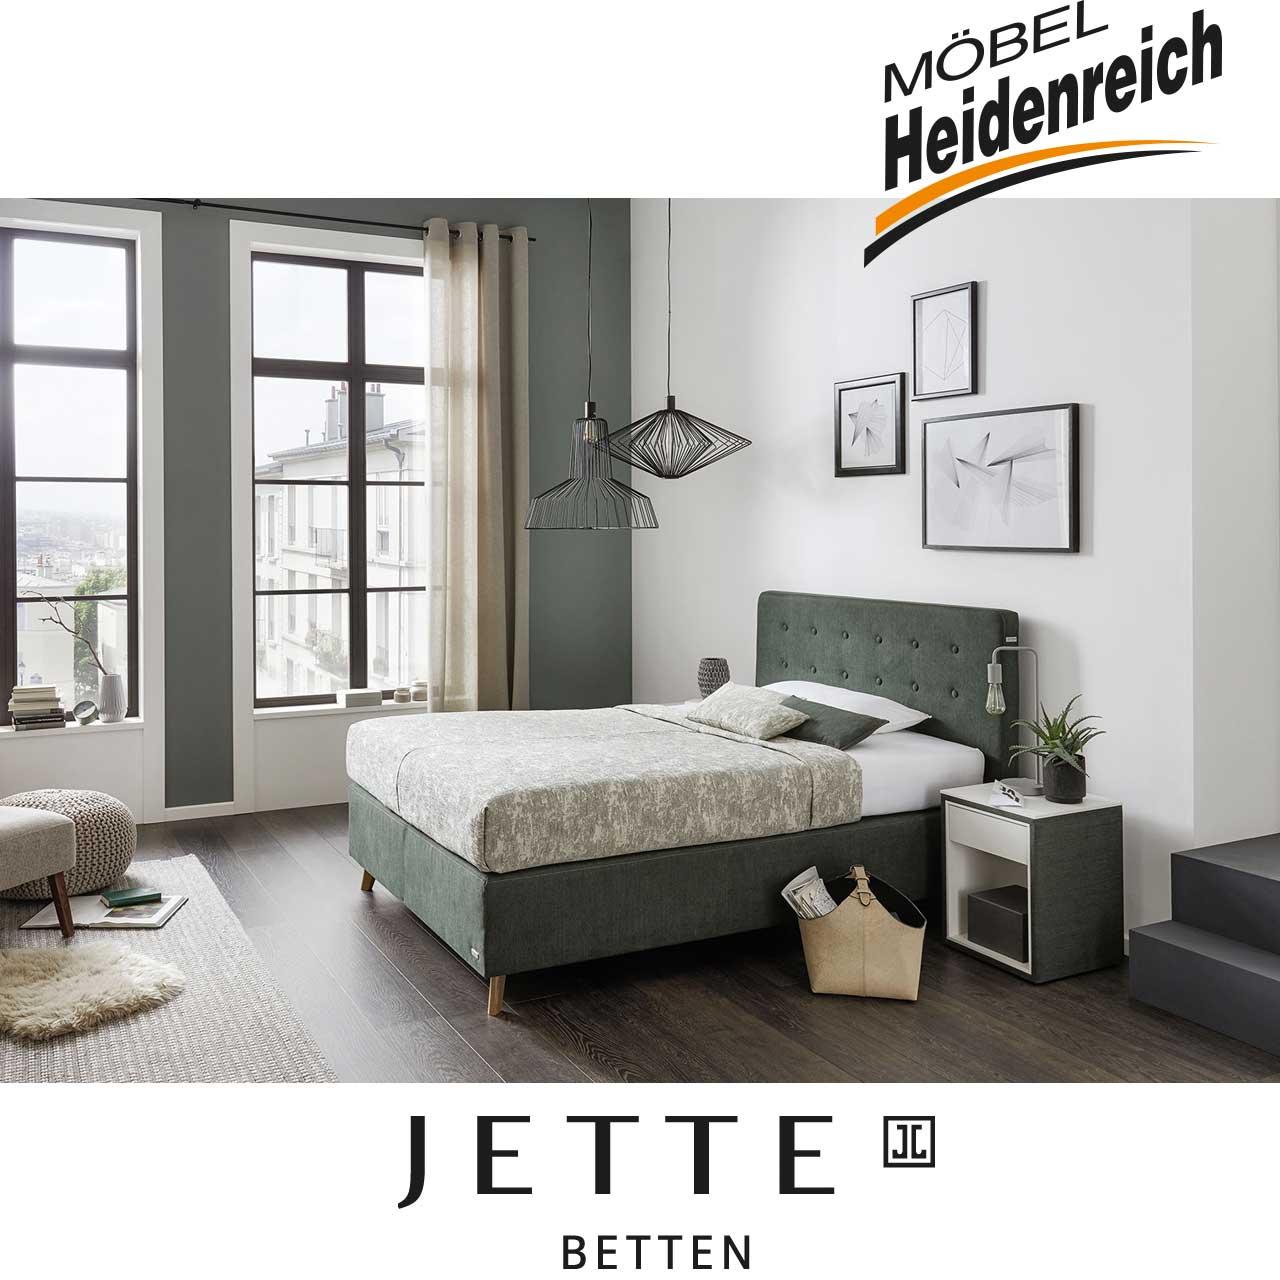 Full Size of Jette Betten 105 Boxspringbett Mbel Heidenreich Bad Sulza Hotel An Der Therme Deckenleuchte Schlafzimmer Wellnessurlaub Baden Württemberg Dusche Bodengleich Bett Www Moebel De Betten